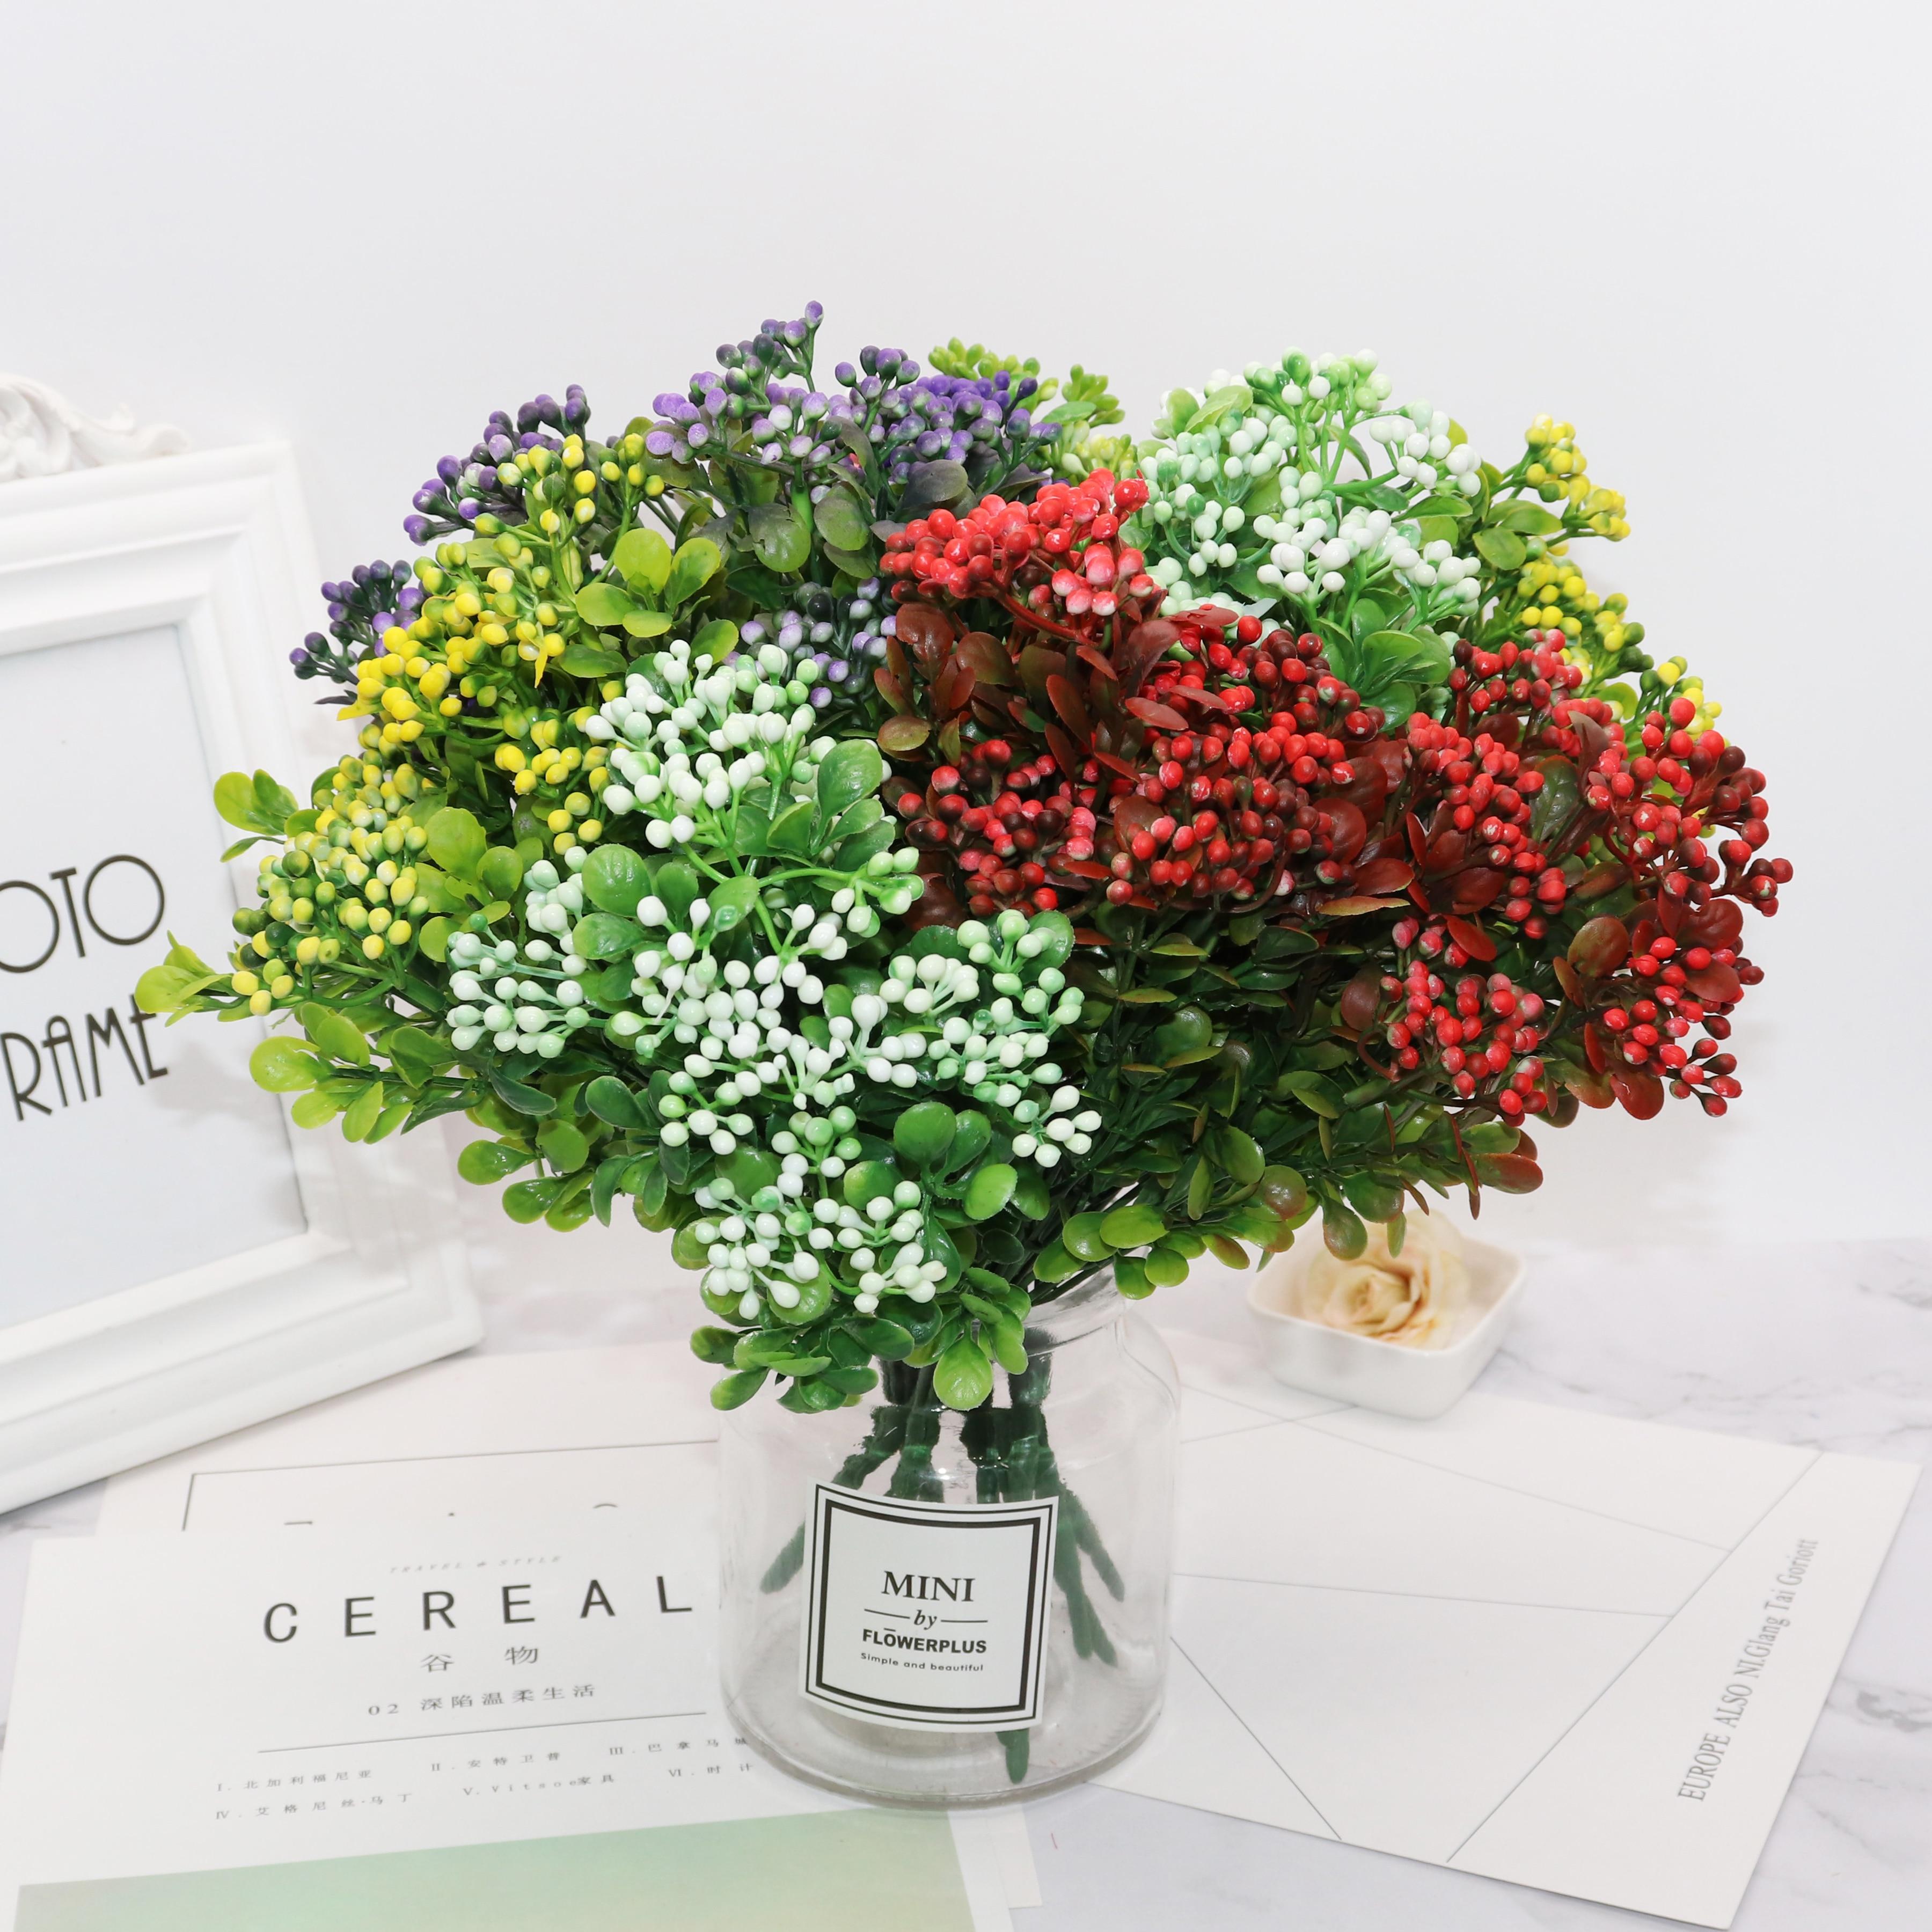 Ramo de flores de baya artificiales verdes de 7 ramas, flores de frutas artificiales, mini hojas, decoración de boda para sala de estar al aire libre